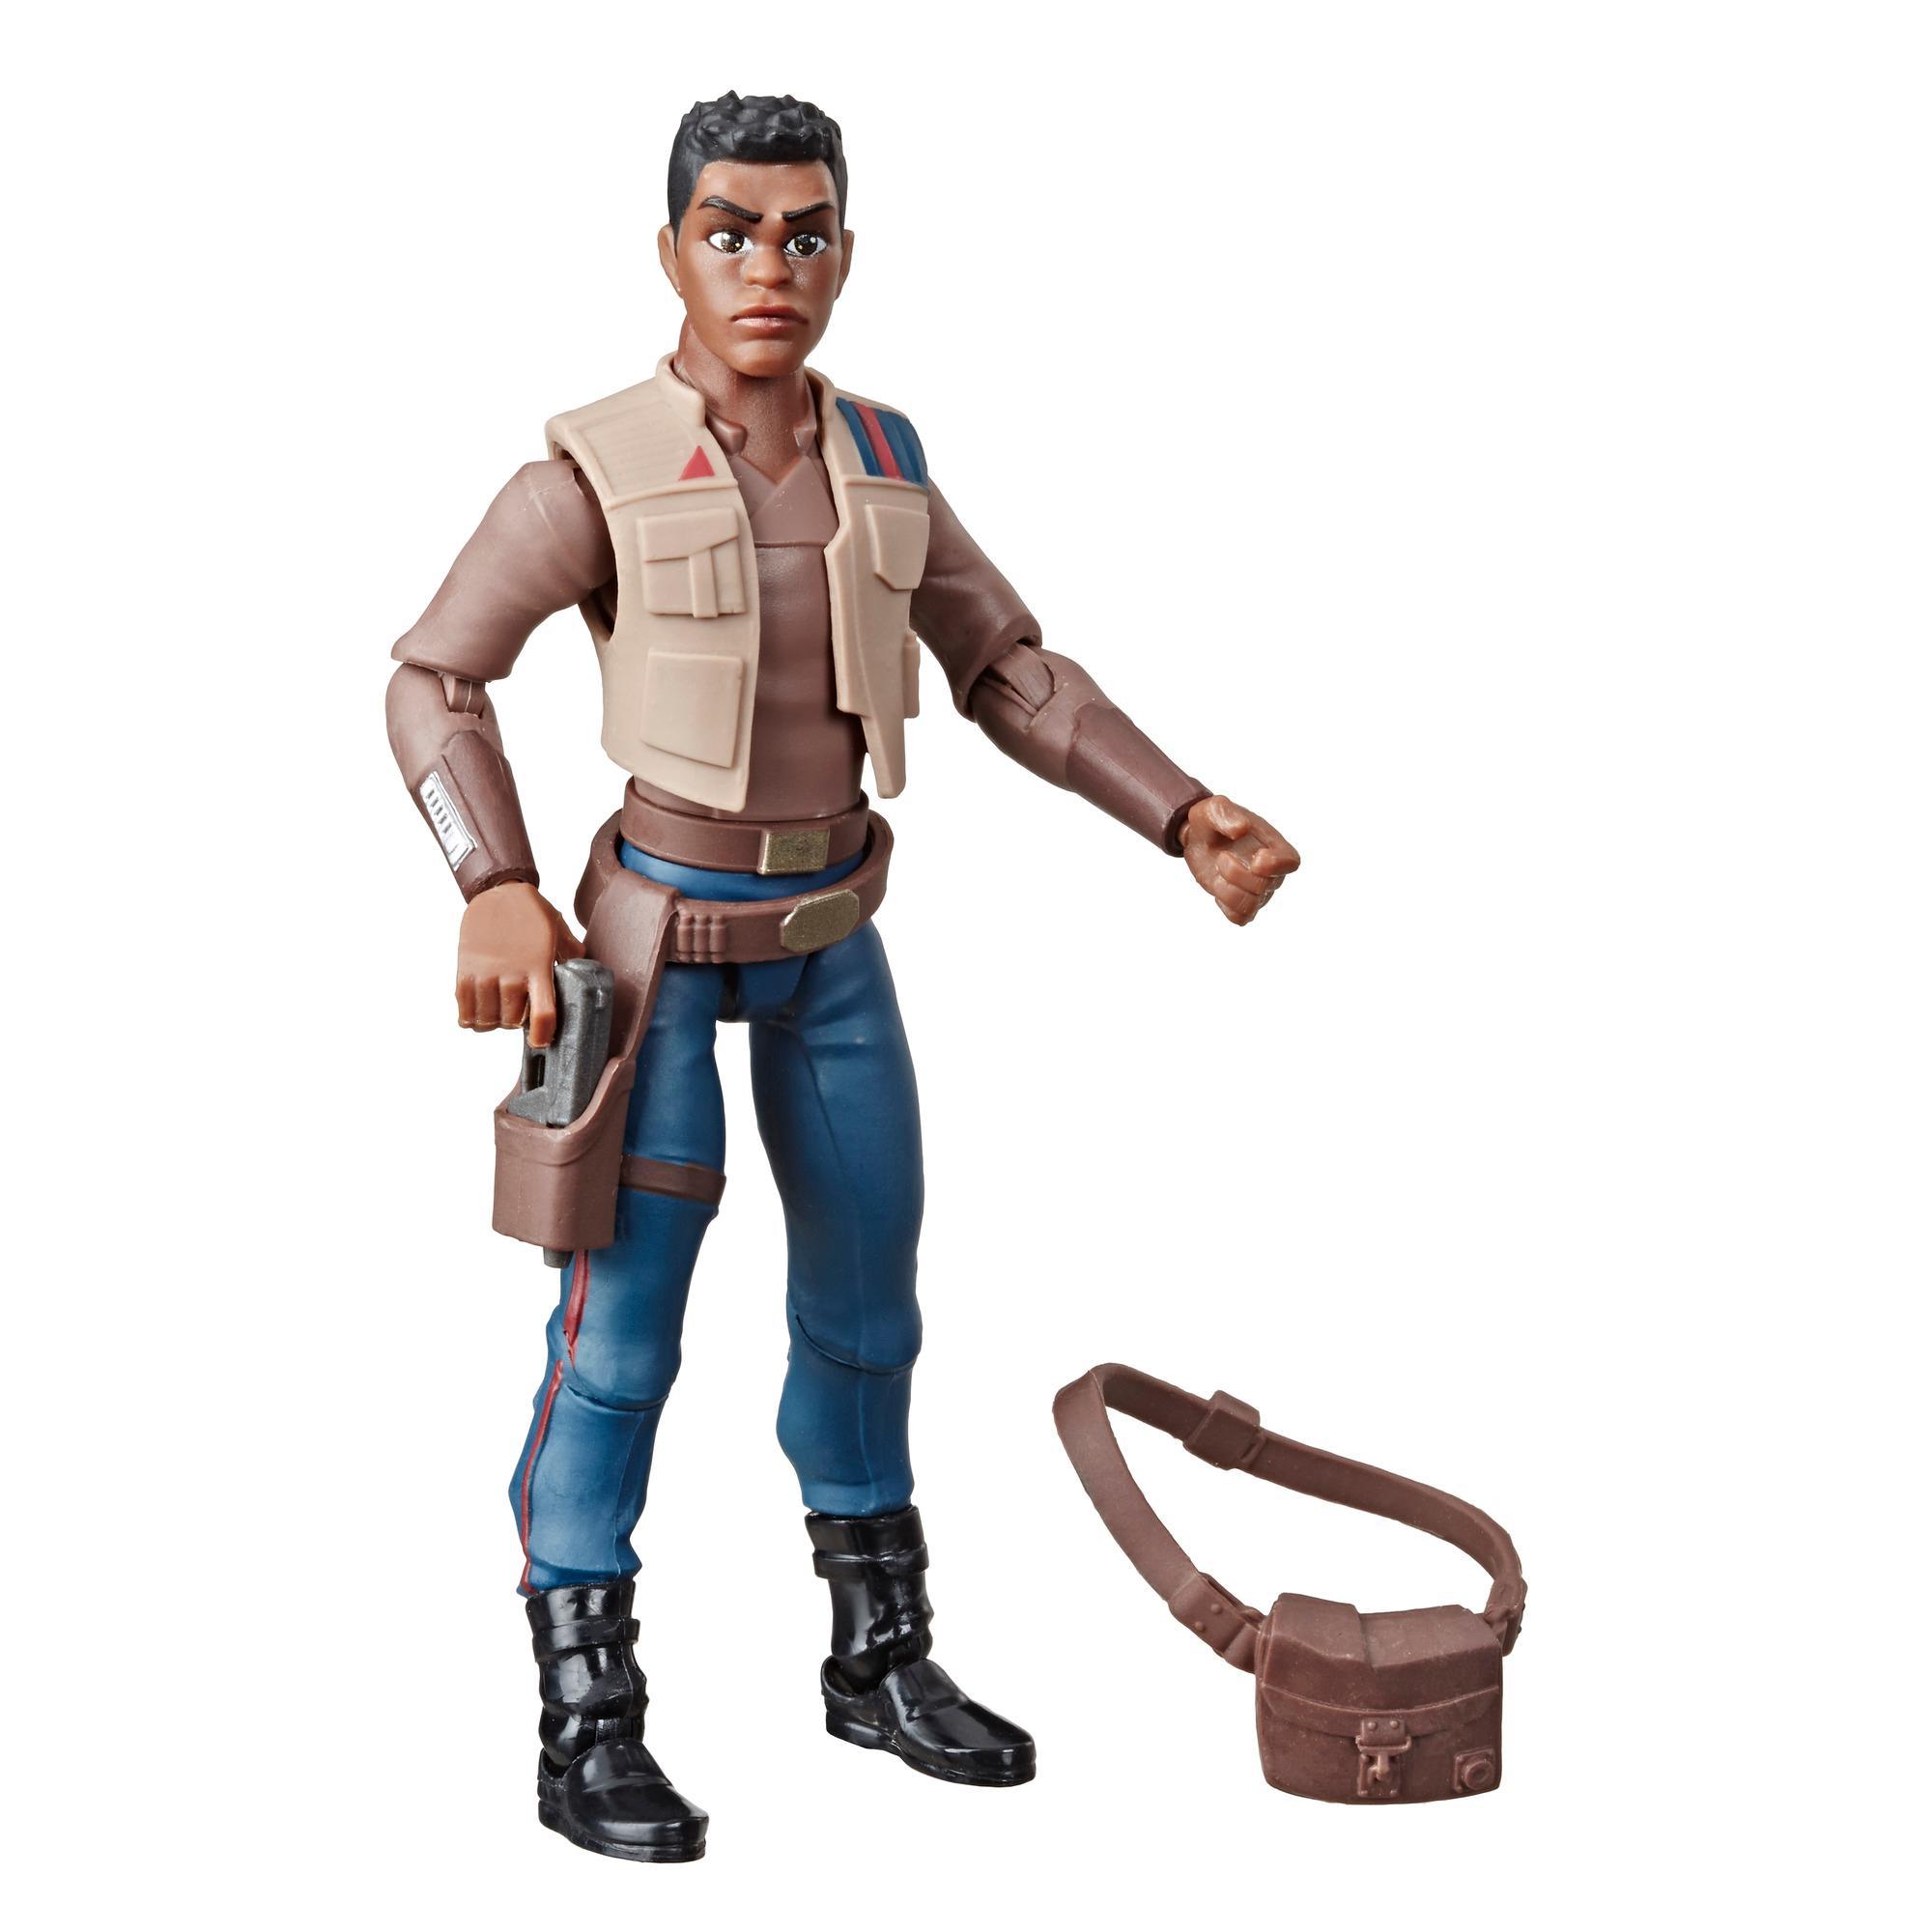 Star Wars Galaxy of Adventures Finn Action-Figur